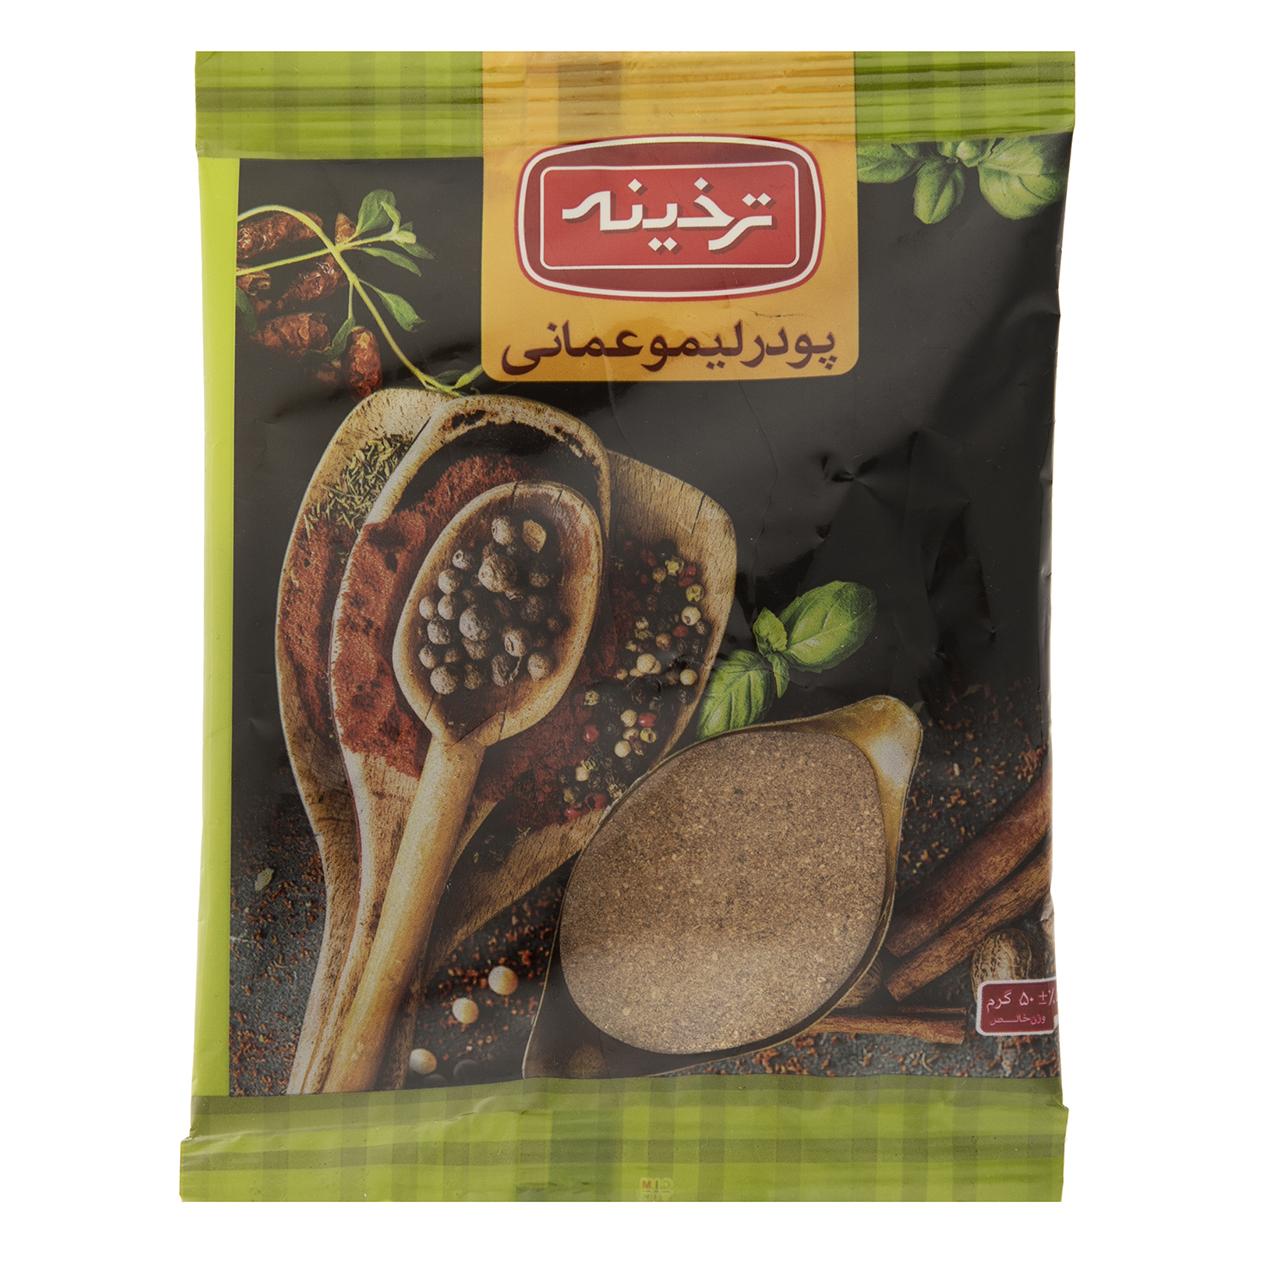 پودر لیمو عمانی ترخینه مقدار 50 گرم